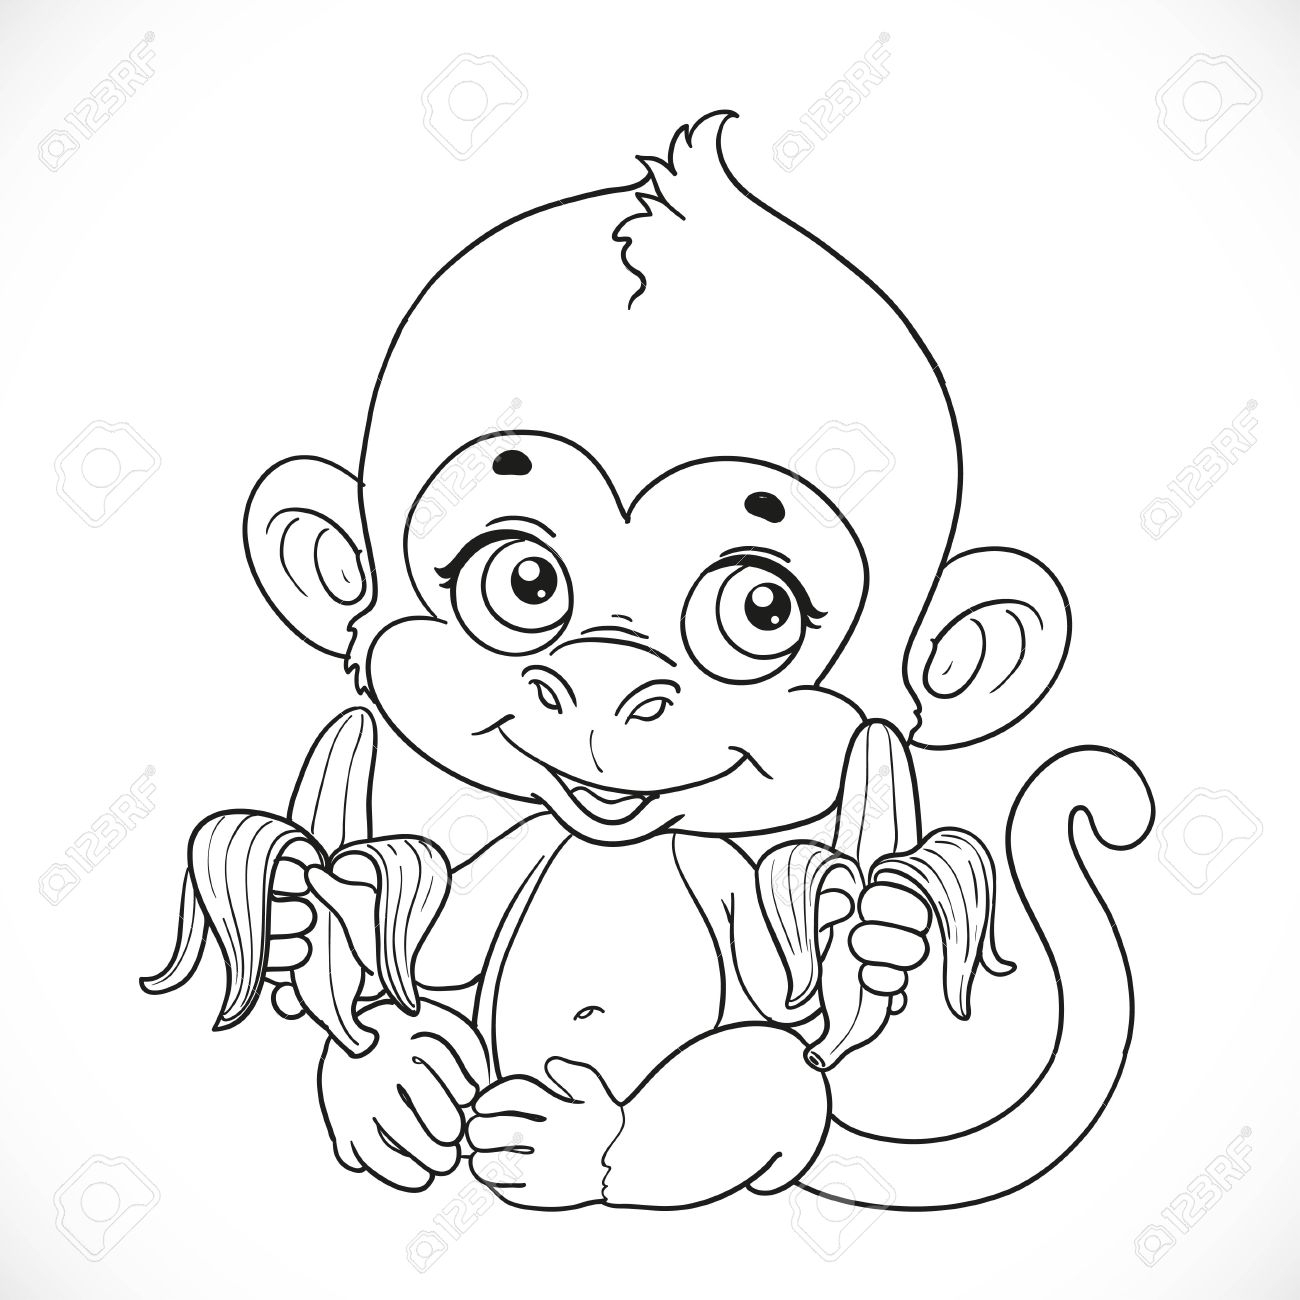 Cute Monkey Drawing At Getdrawings